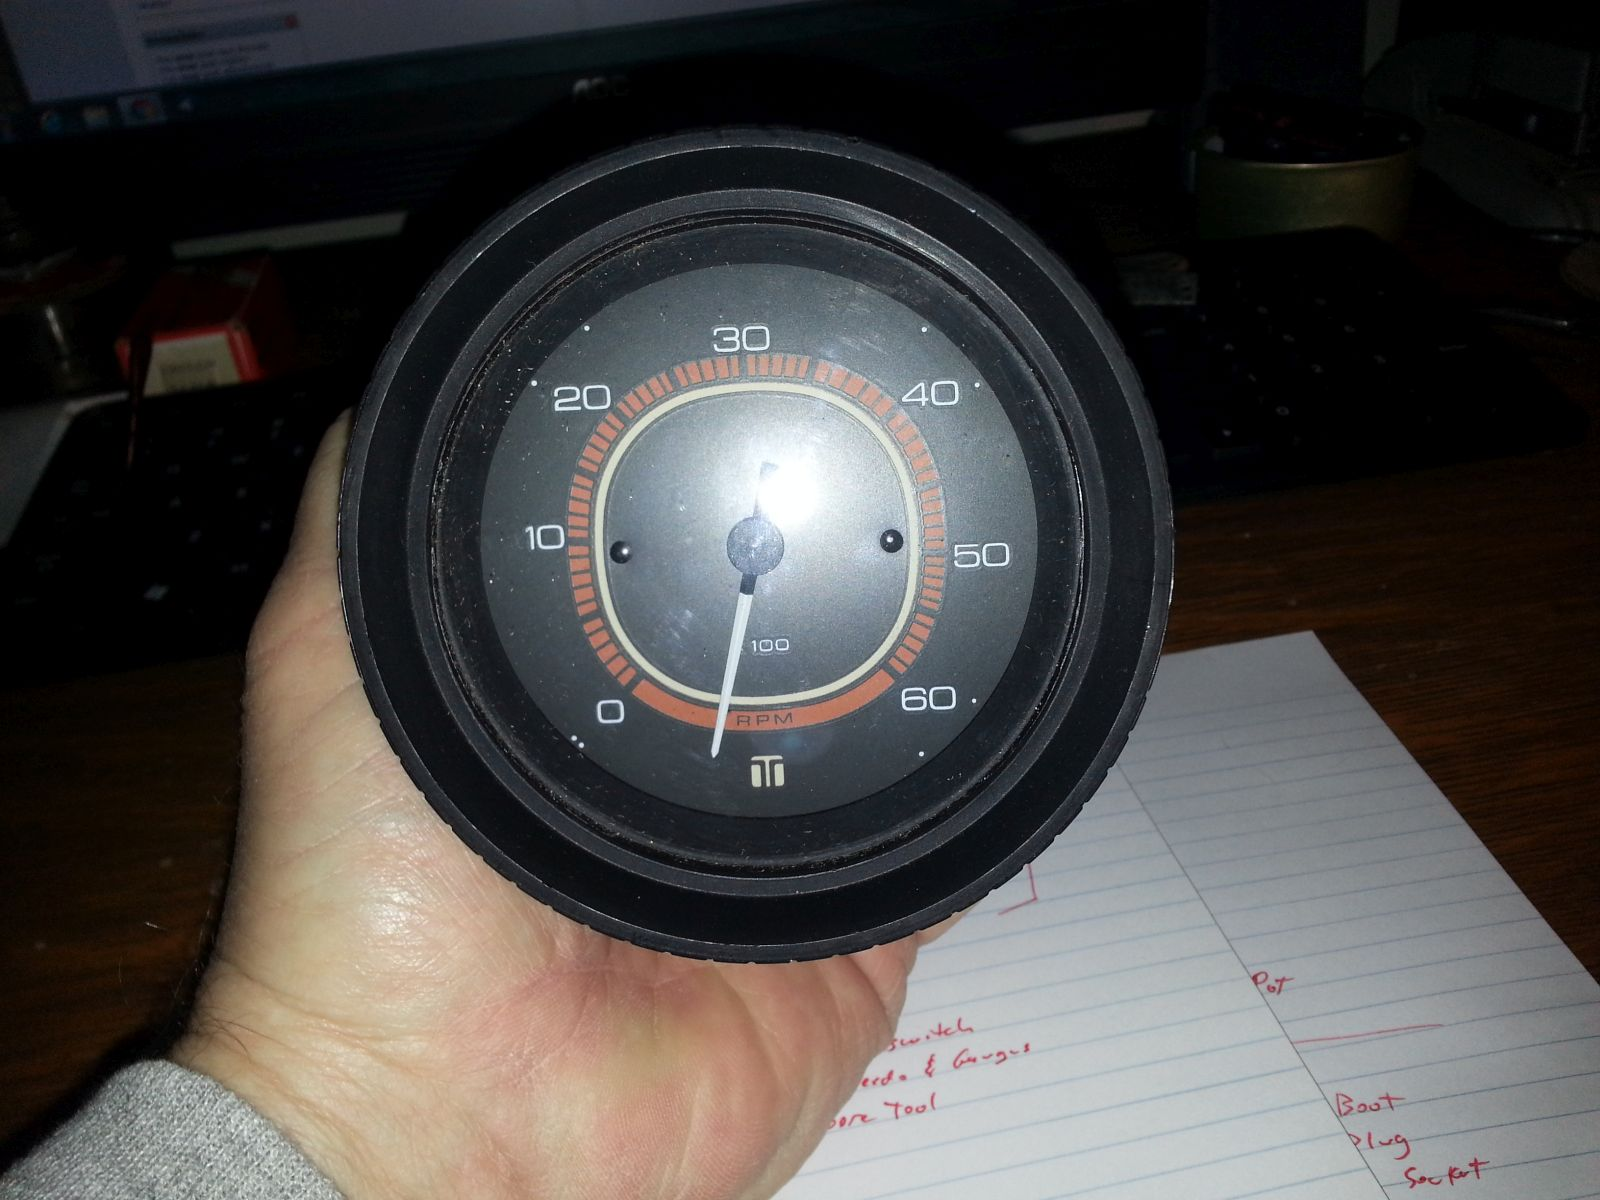 Click image for larger version  Name:teleflex-alternator-tach-front.jpg Views:66 Size:197.0 KB ID:253604